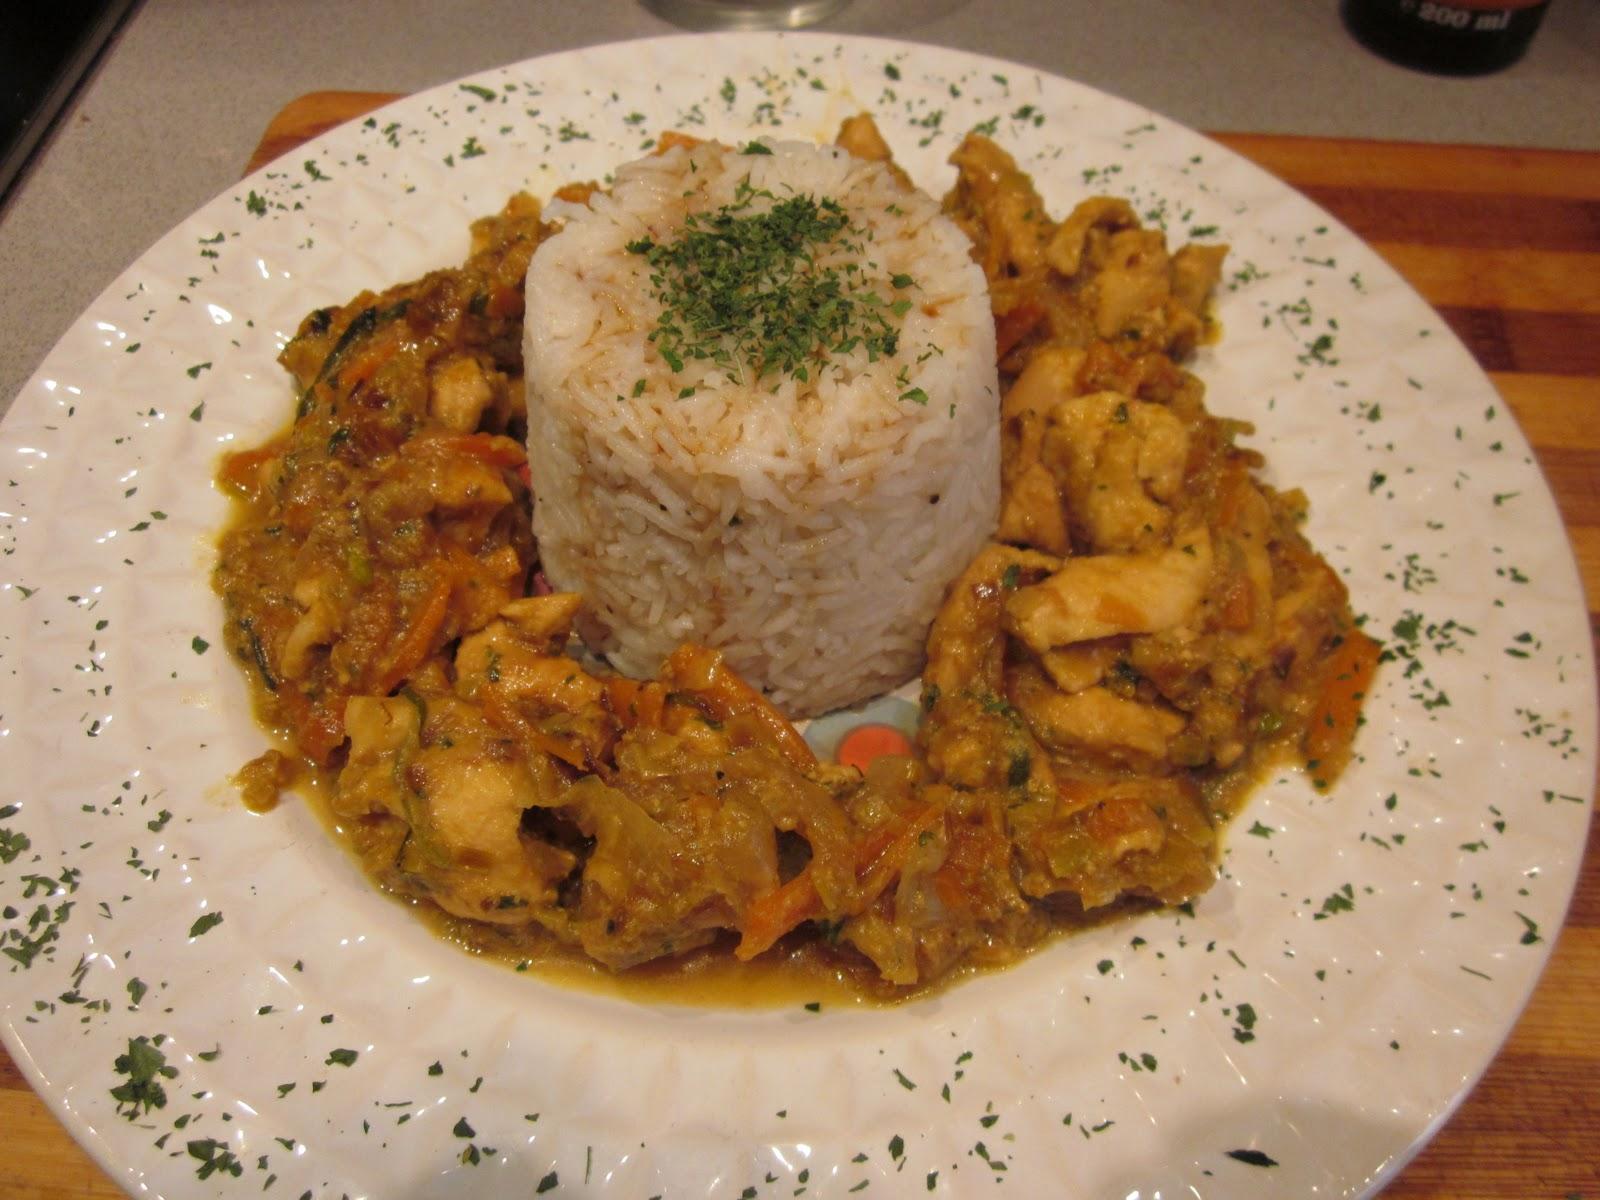 La merluza hermen utica pollo al curry con arroz basmati for Como cocinar pollo al curry